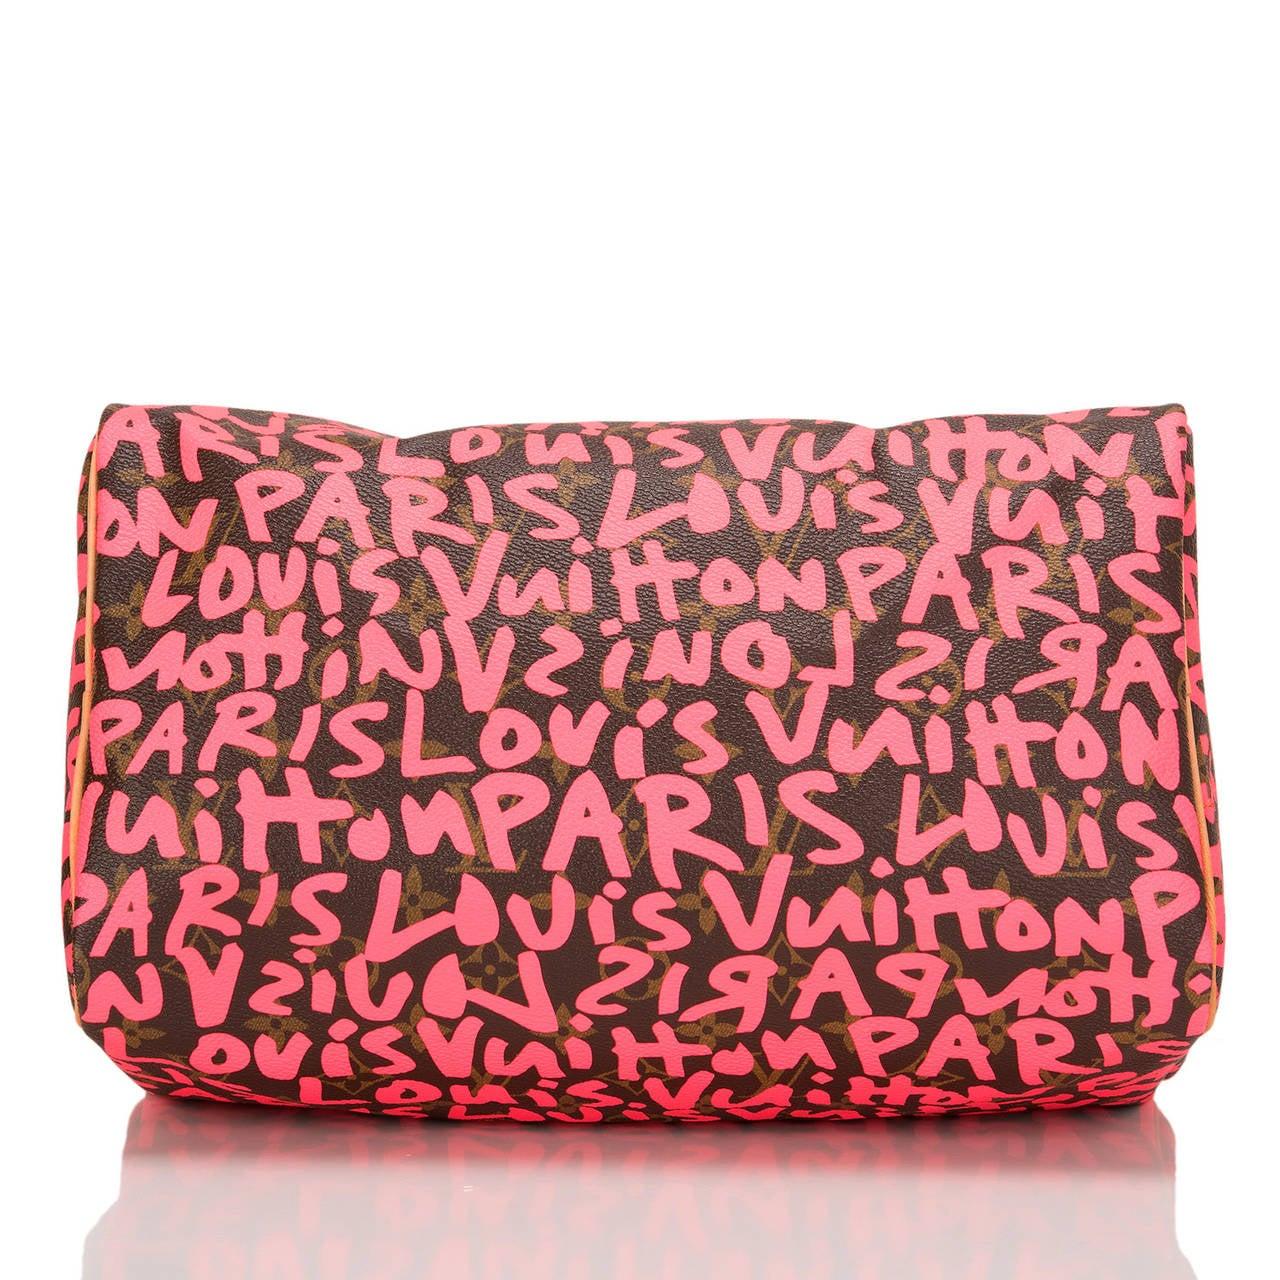 Women's Louis Vuitton Fuchsia Pink Monogram Graffiti Speedy 30 For Sale